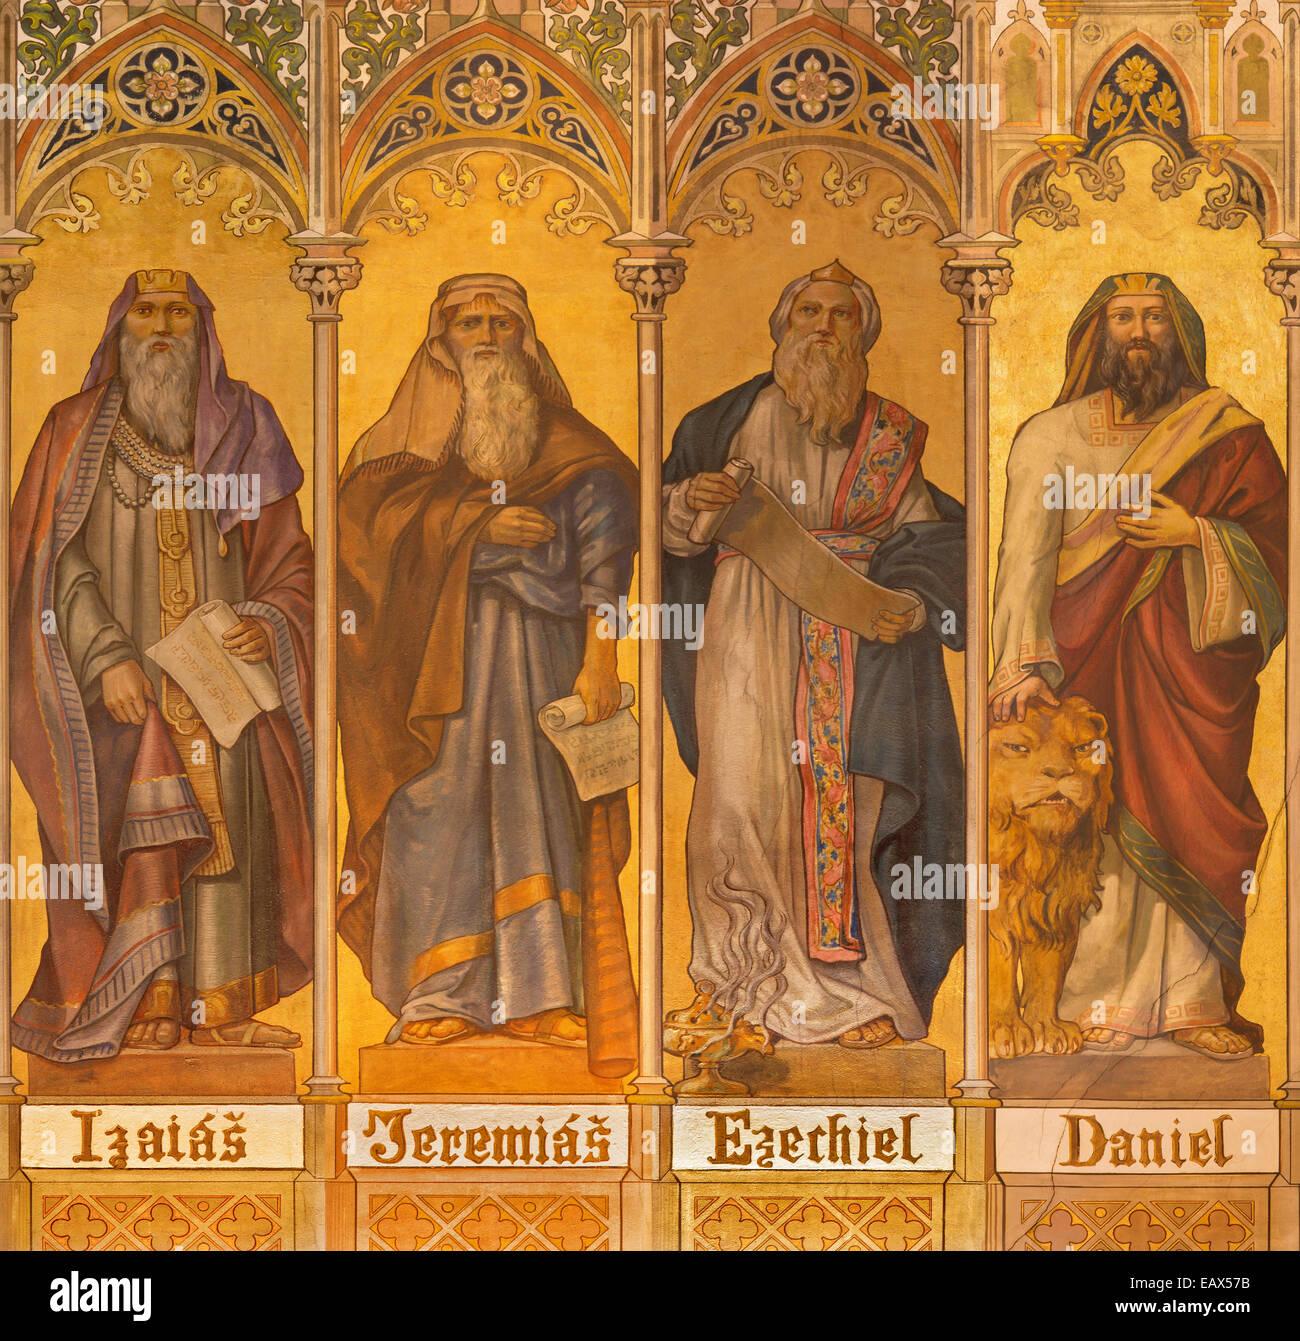 TRNAVA, SLOVAKIA - OCTOBER 14, 2014: The neo-gothic fresco of big prophets Isaiah, Jeremiah, Ezekiel, Daniel in - Stock Image